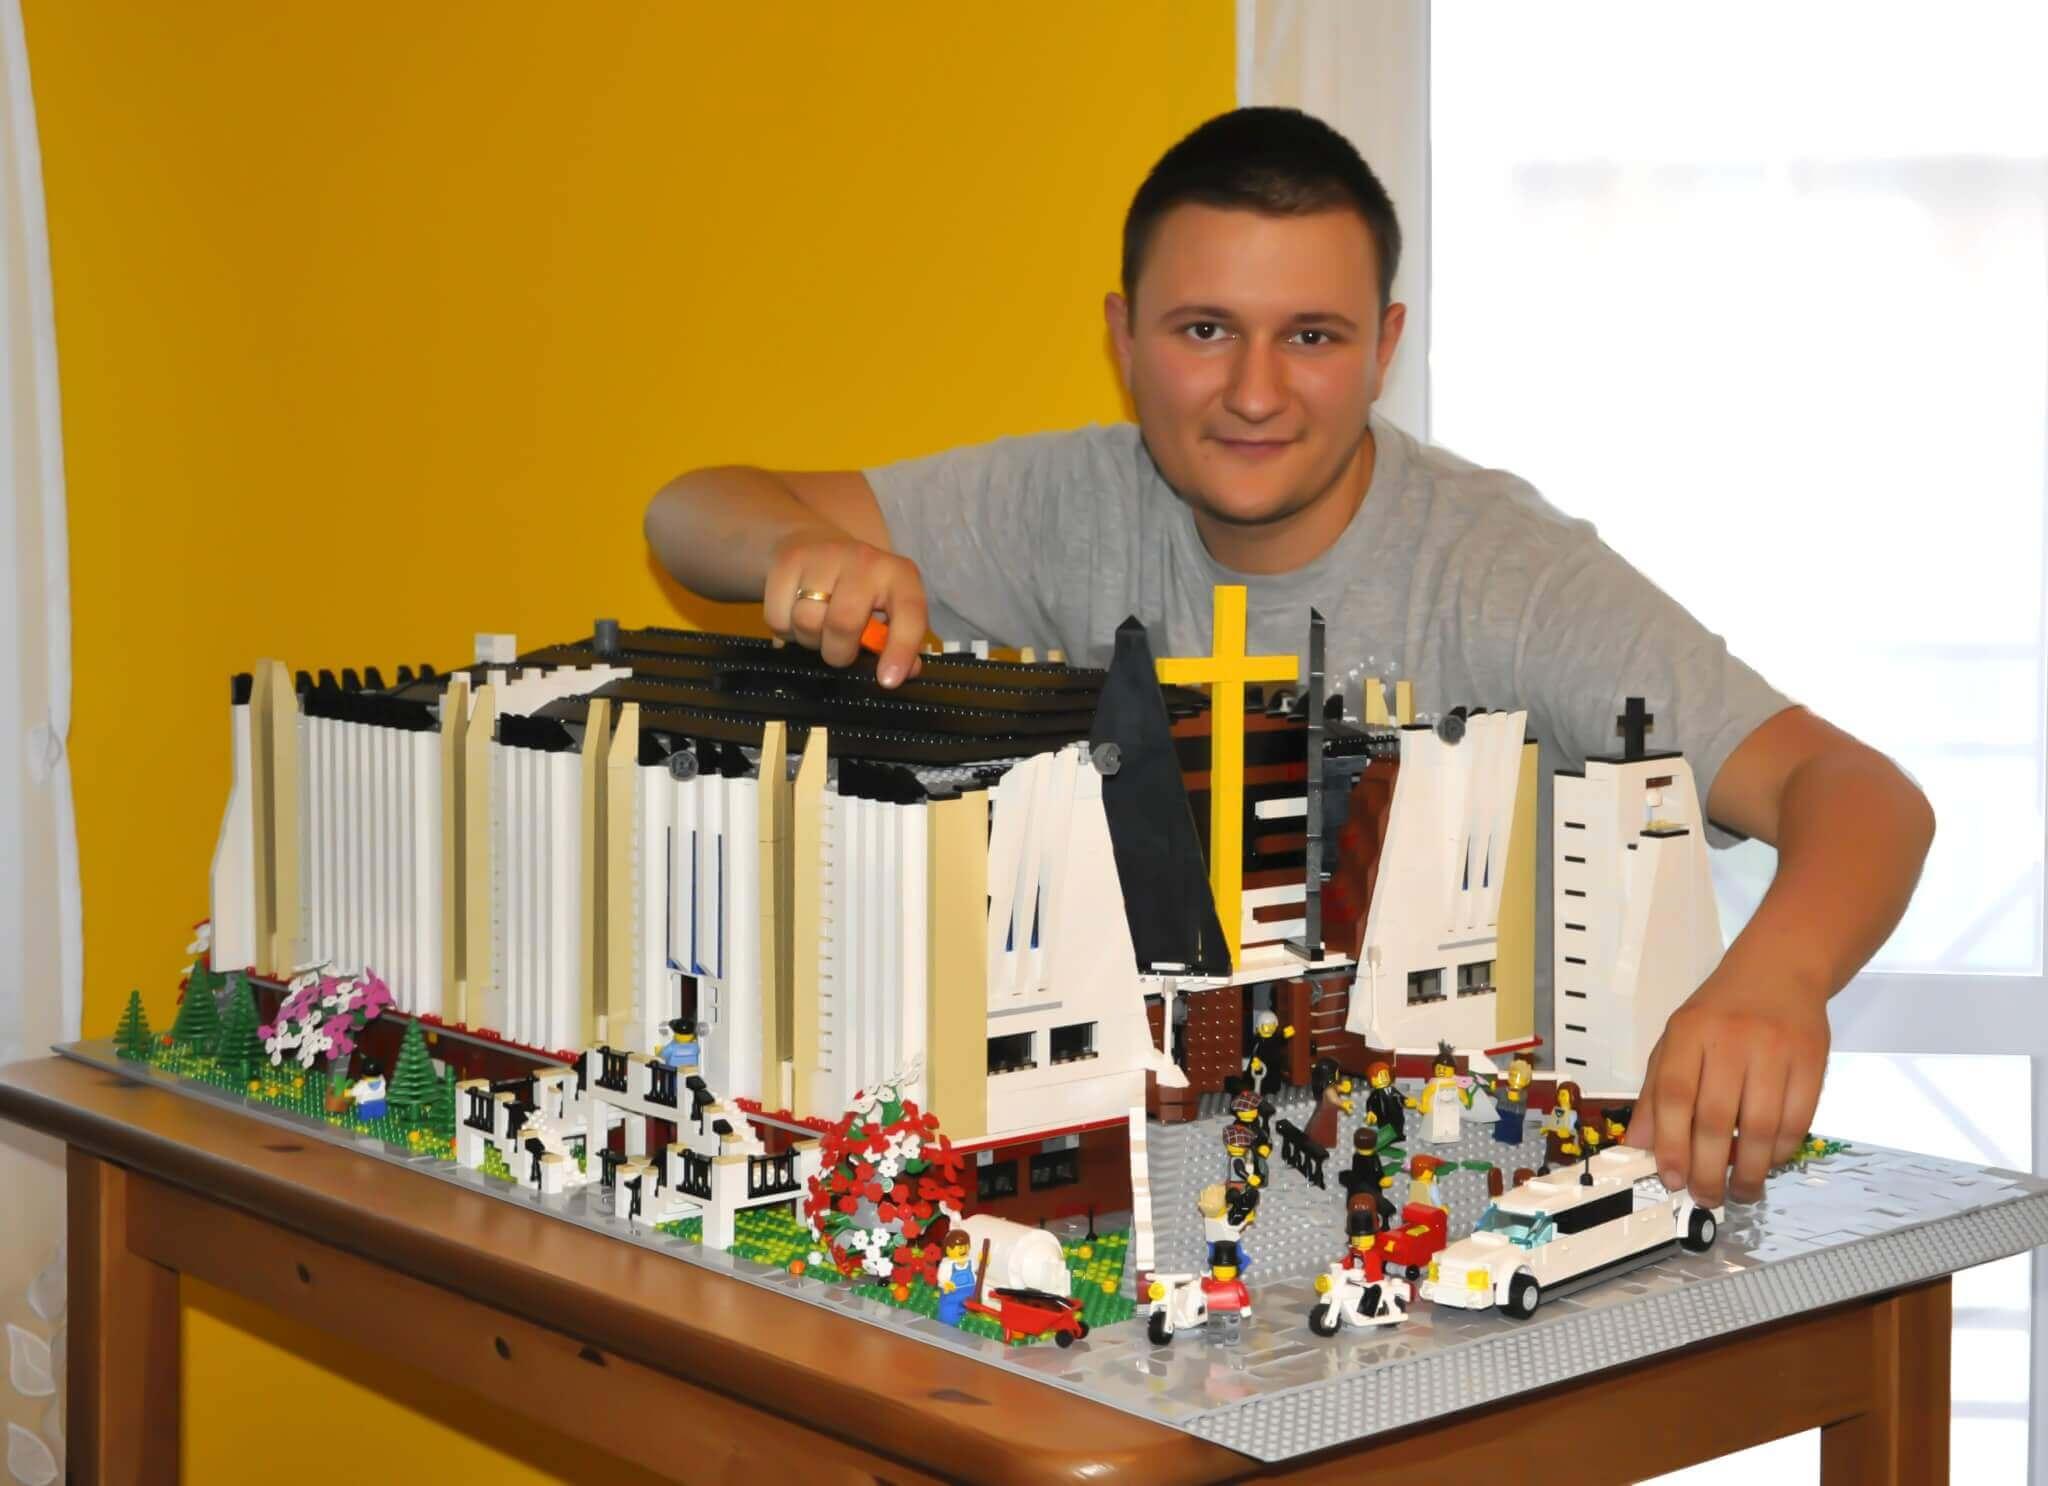 Lego Kościół Ideo Bricks Order Your Custom Lego Moc Modelbuild By